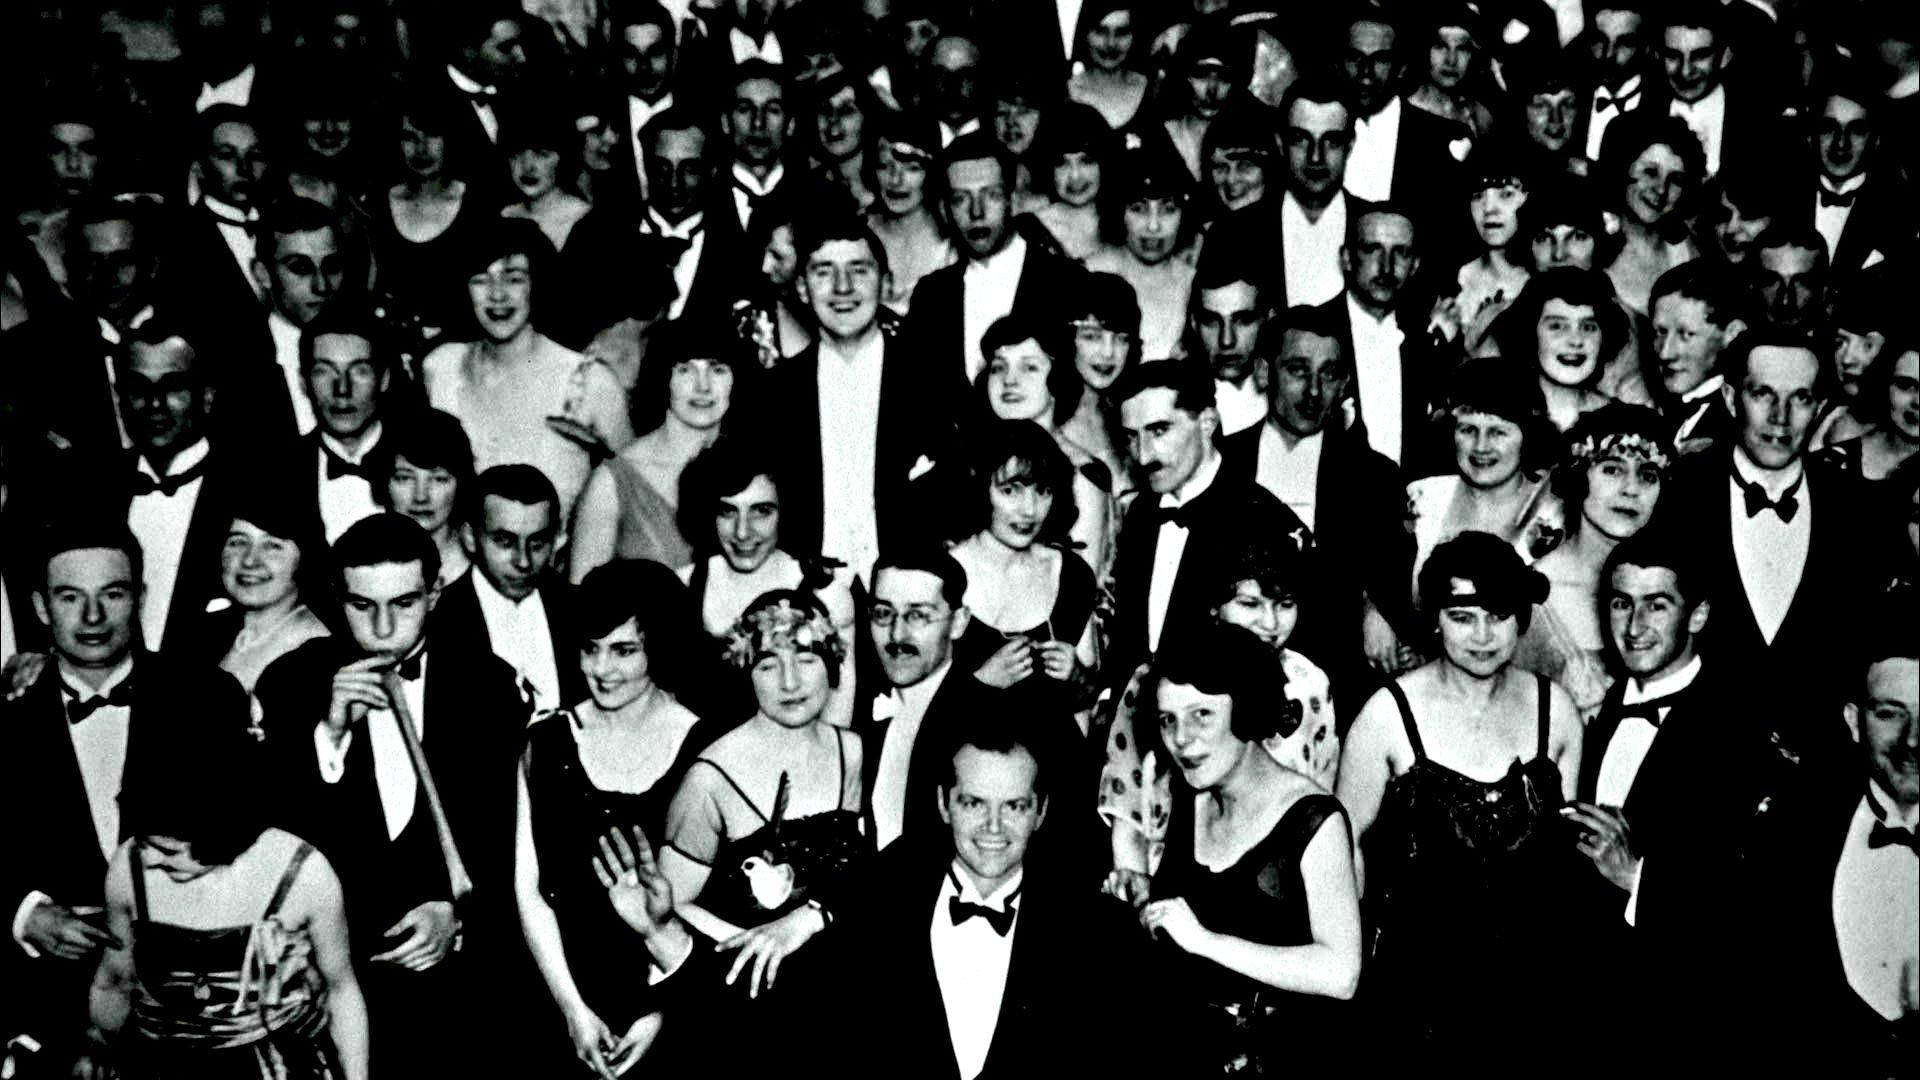 THE SHINING horror thriller dark movie film classic crowd death 1920x1080